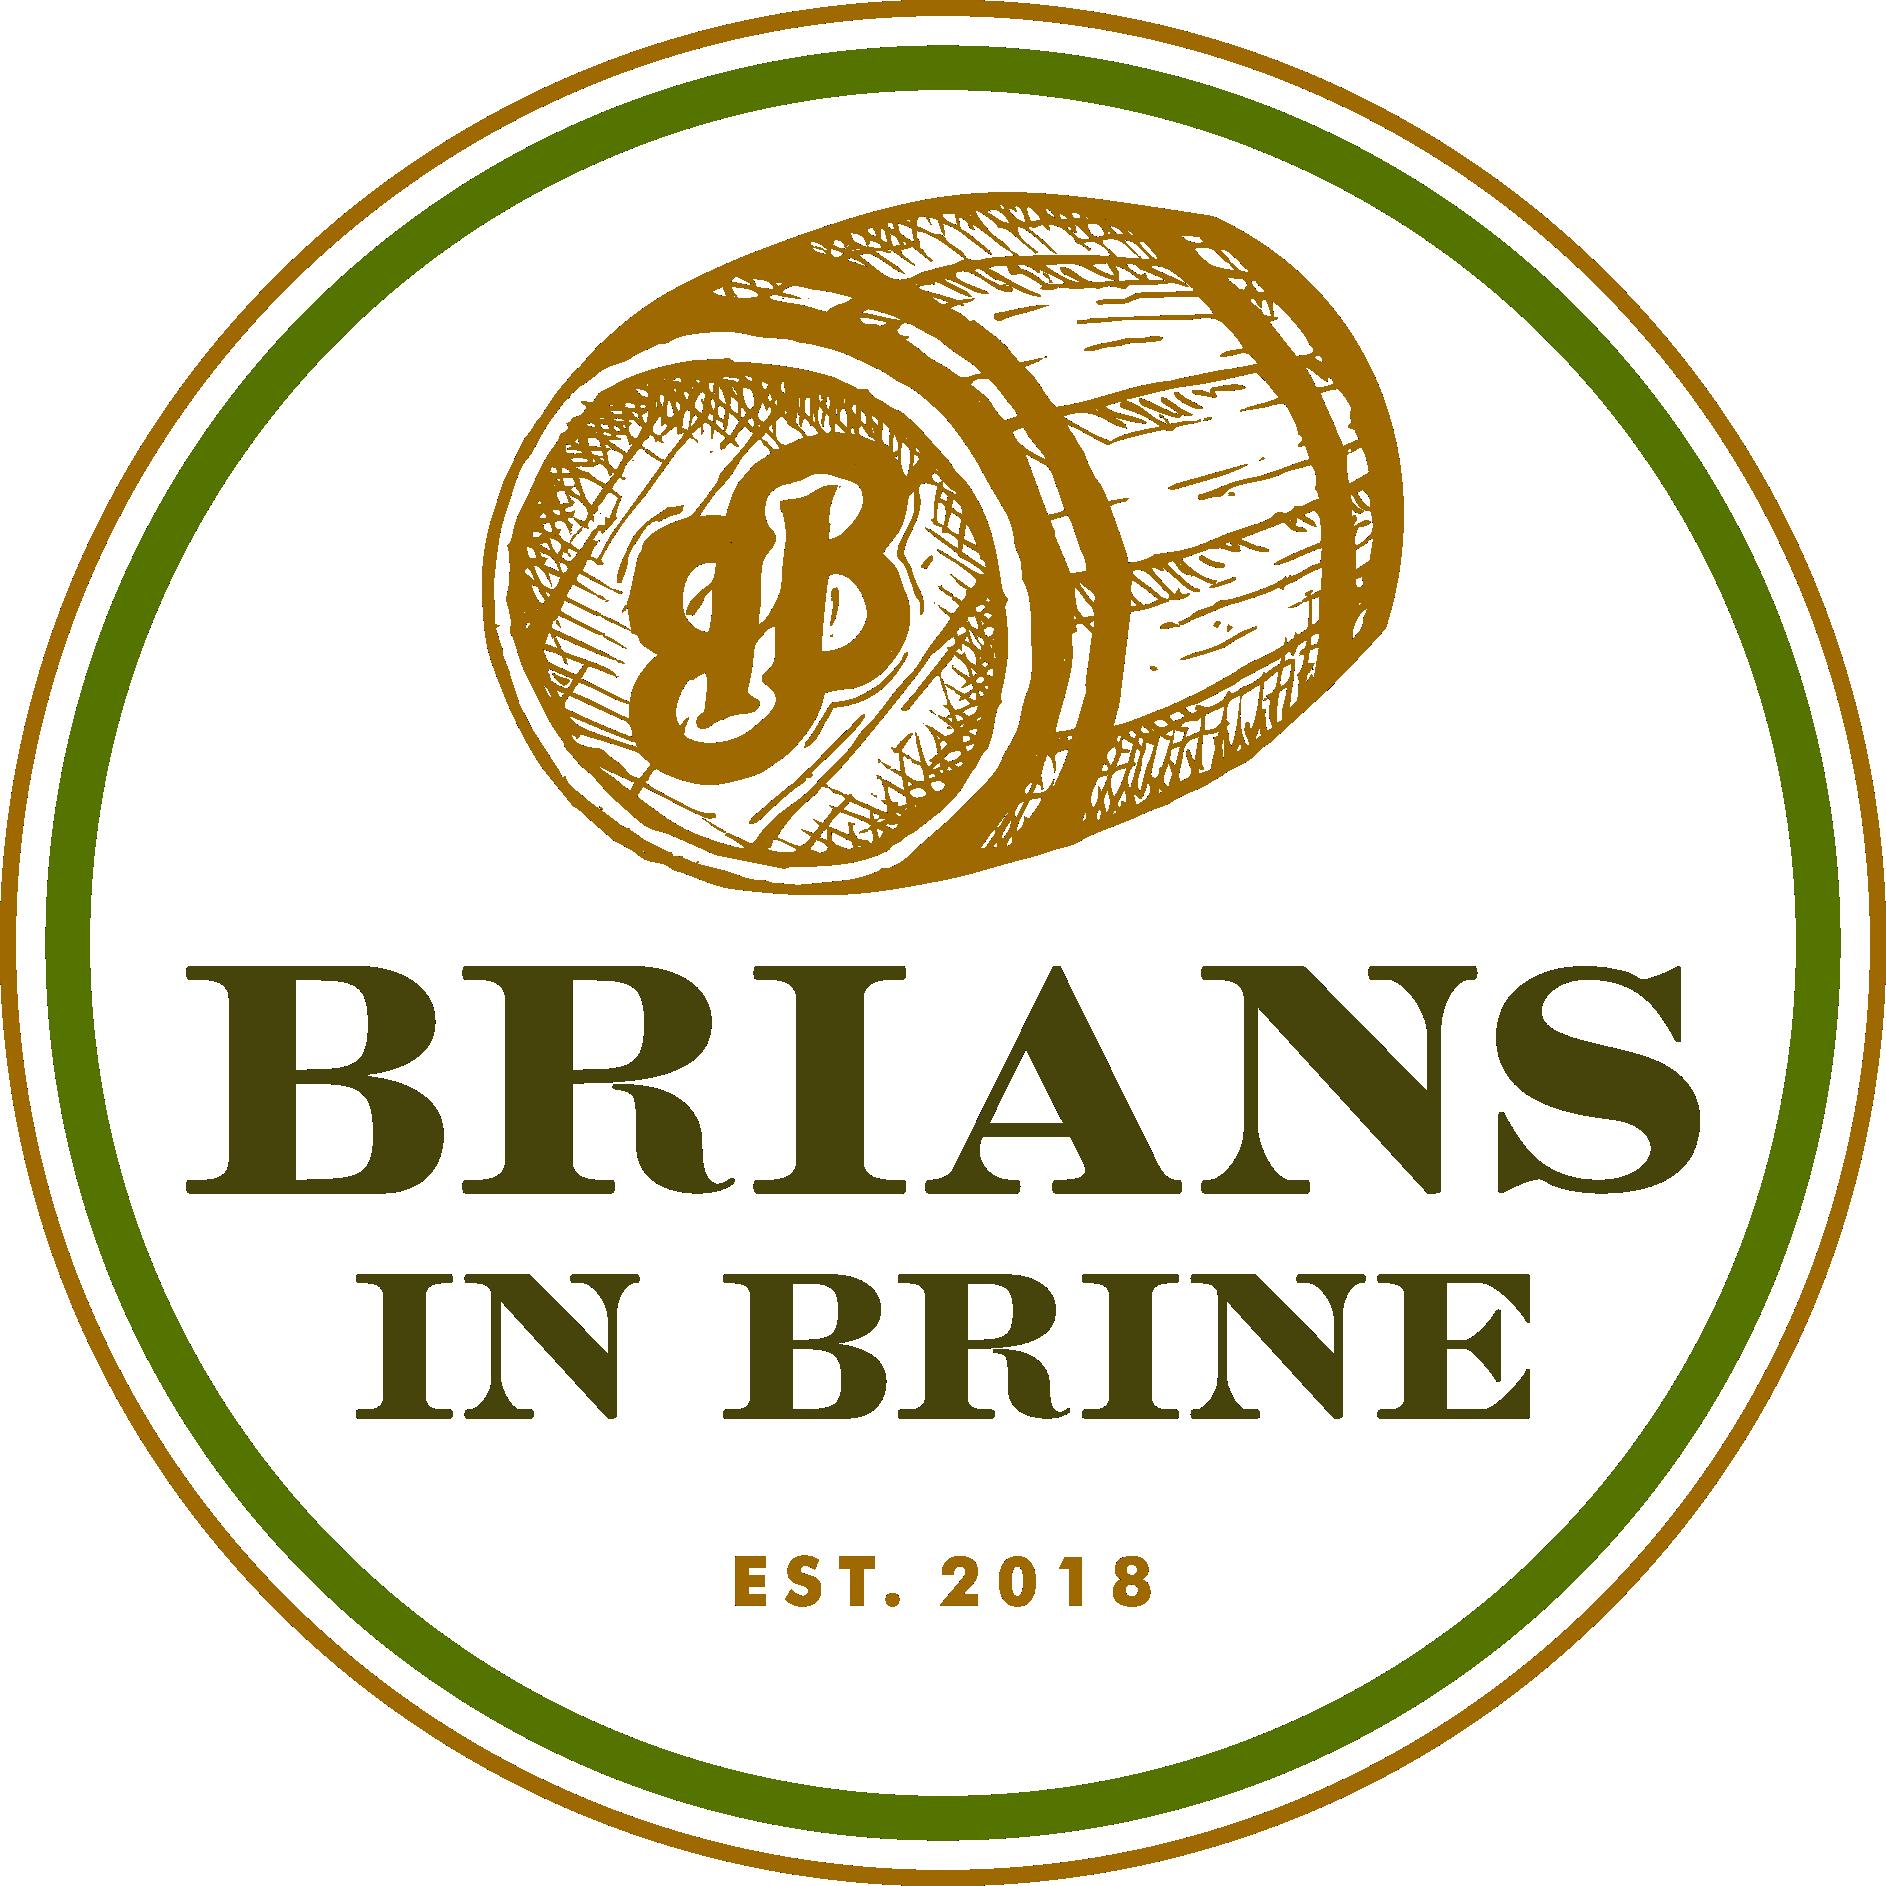 Brian's in Brine Edits